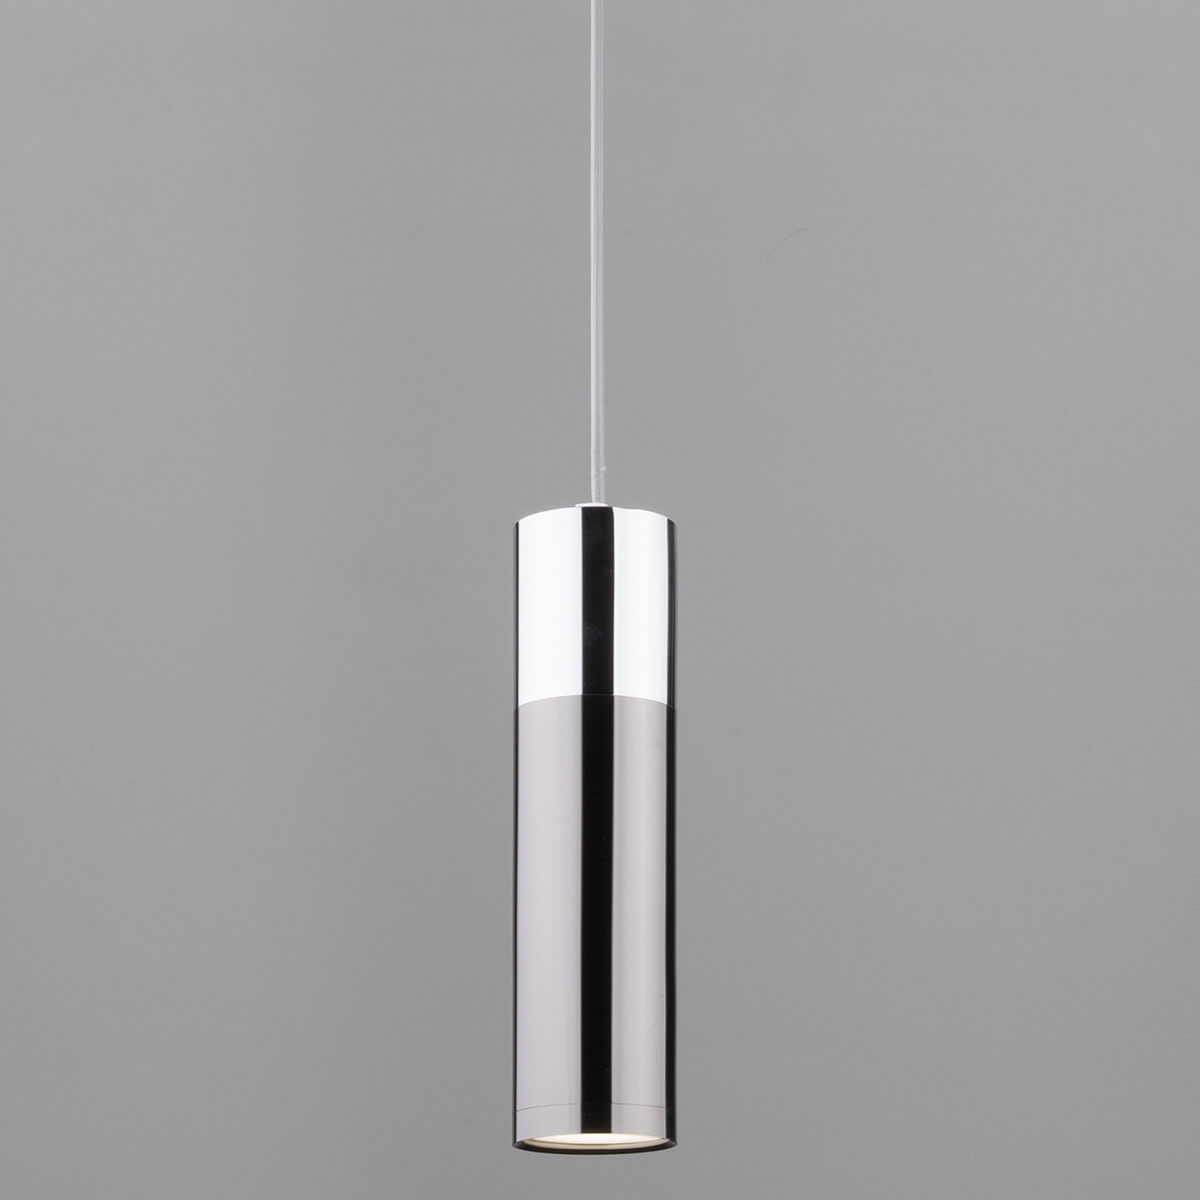 Светильник Eurosvet 50135/1 LED хром/черный жемчуг Double Topper